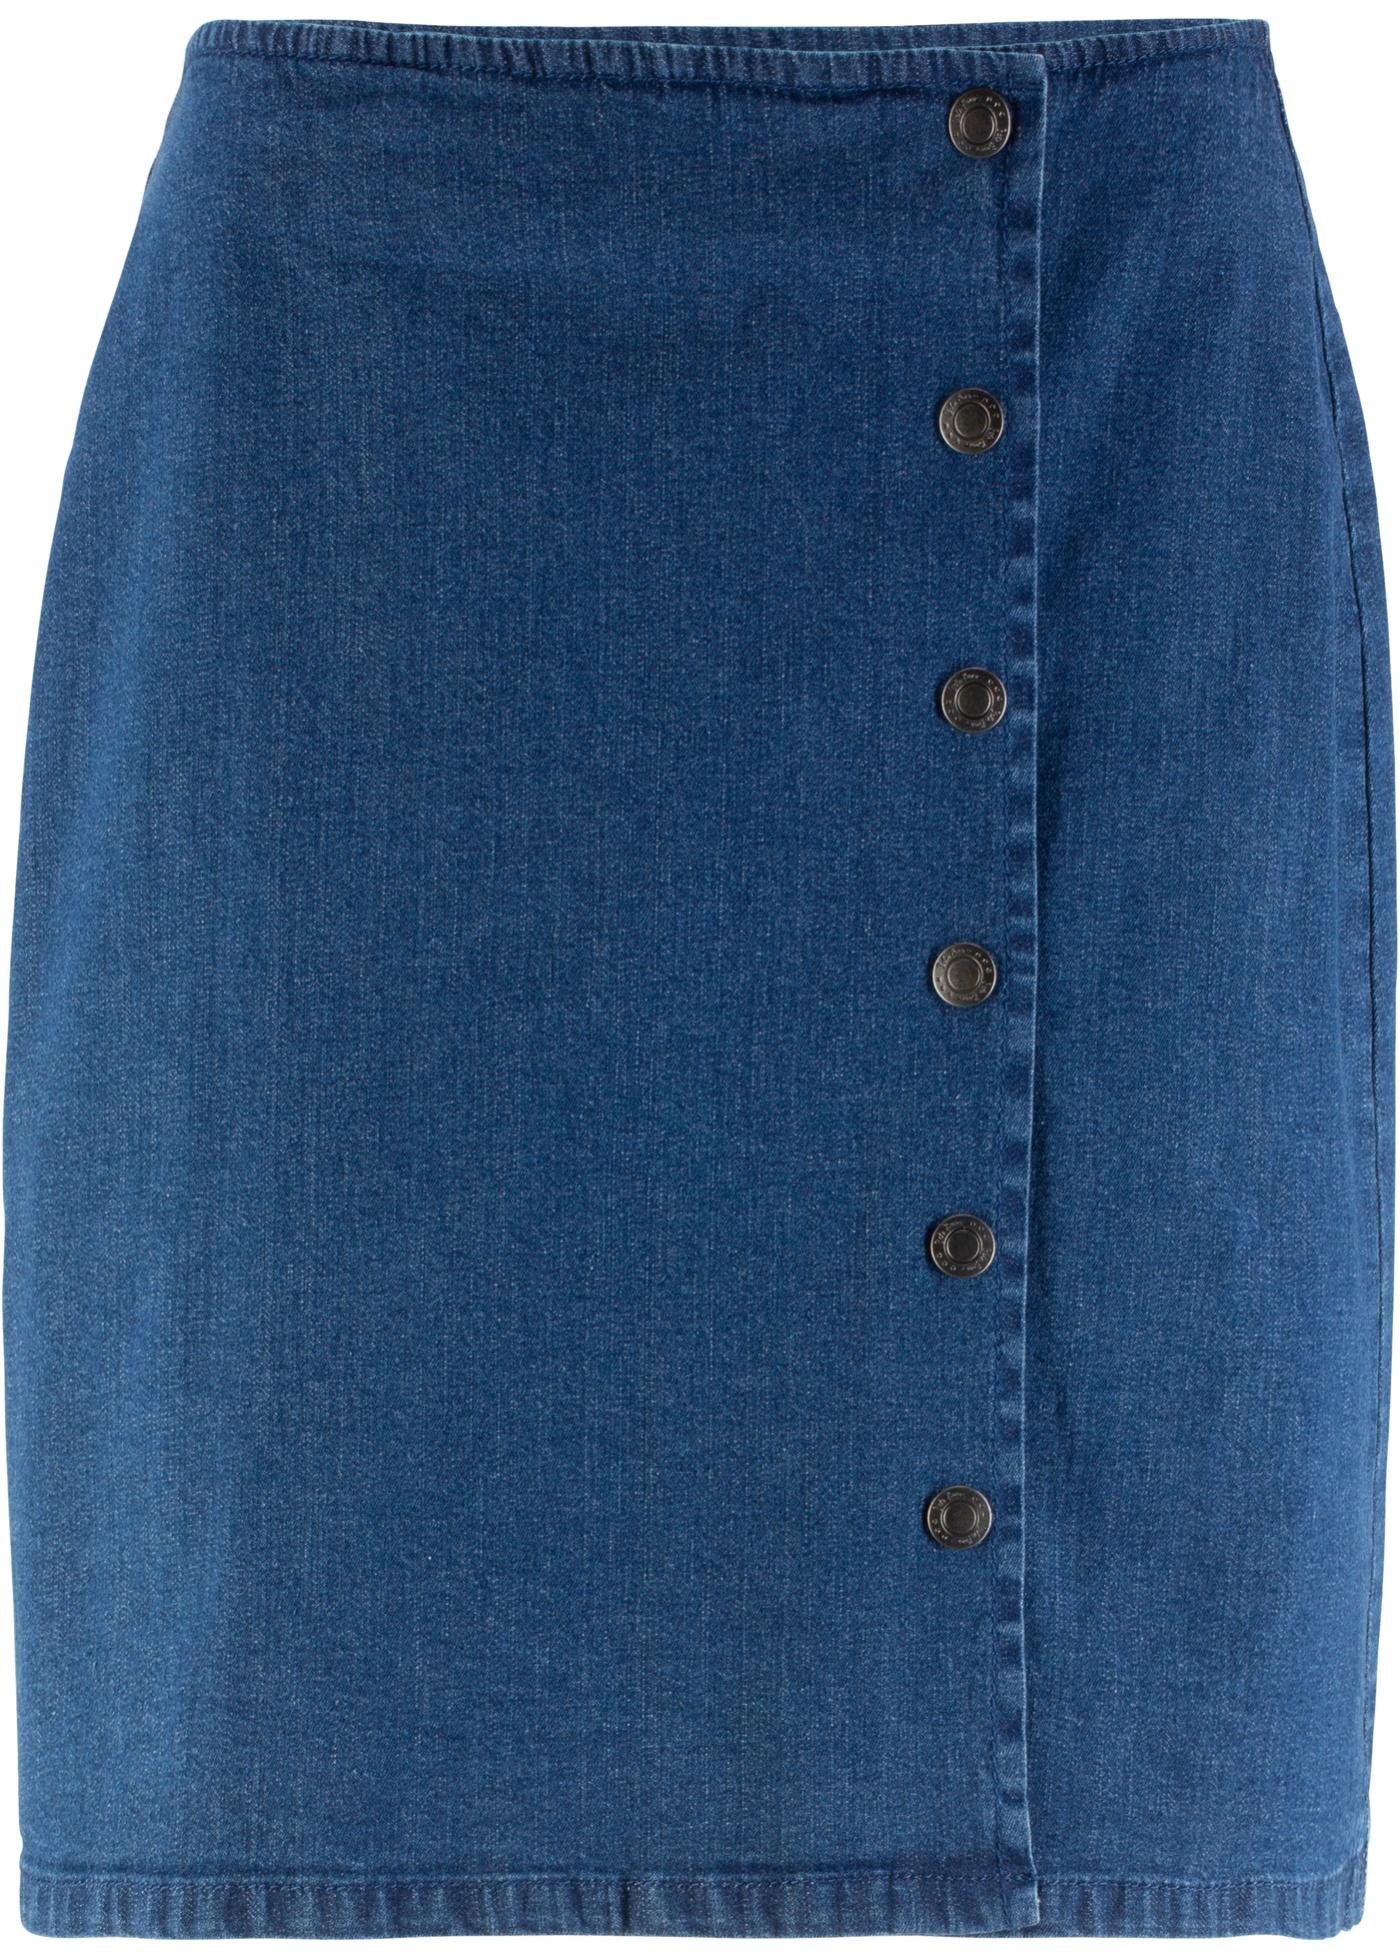 Femme Baner En À Portefeuille Pour Jeanswear Jean Boutons Style Bleu John BonprixJupe Yf7v6Iybmg